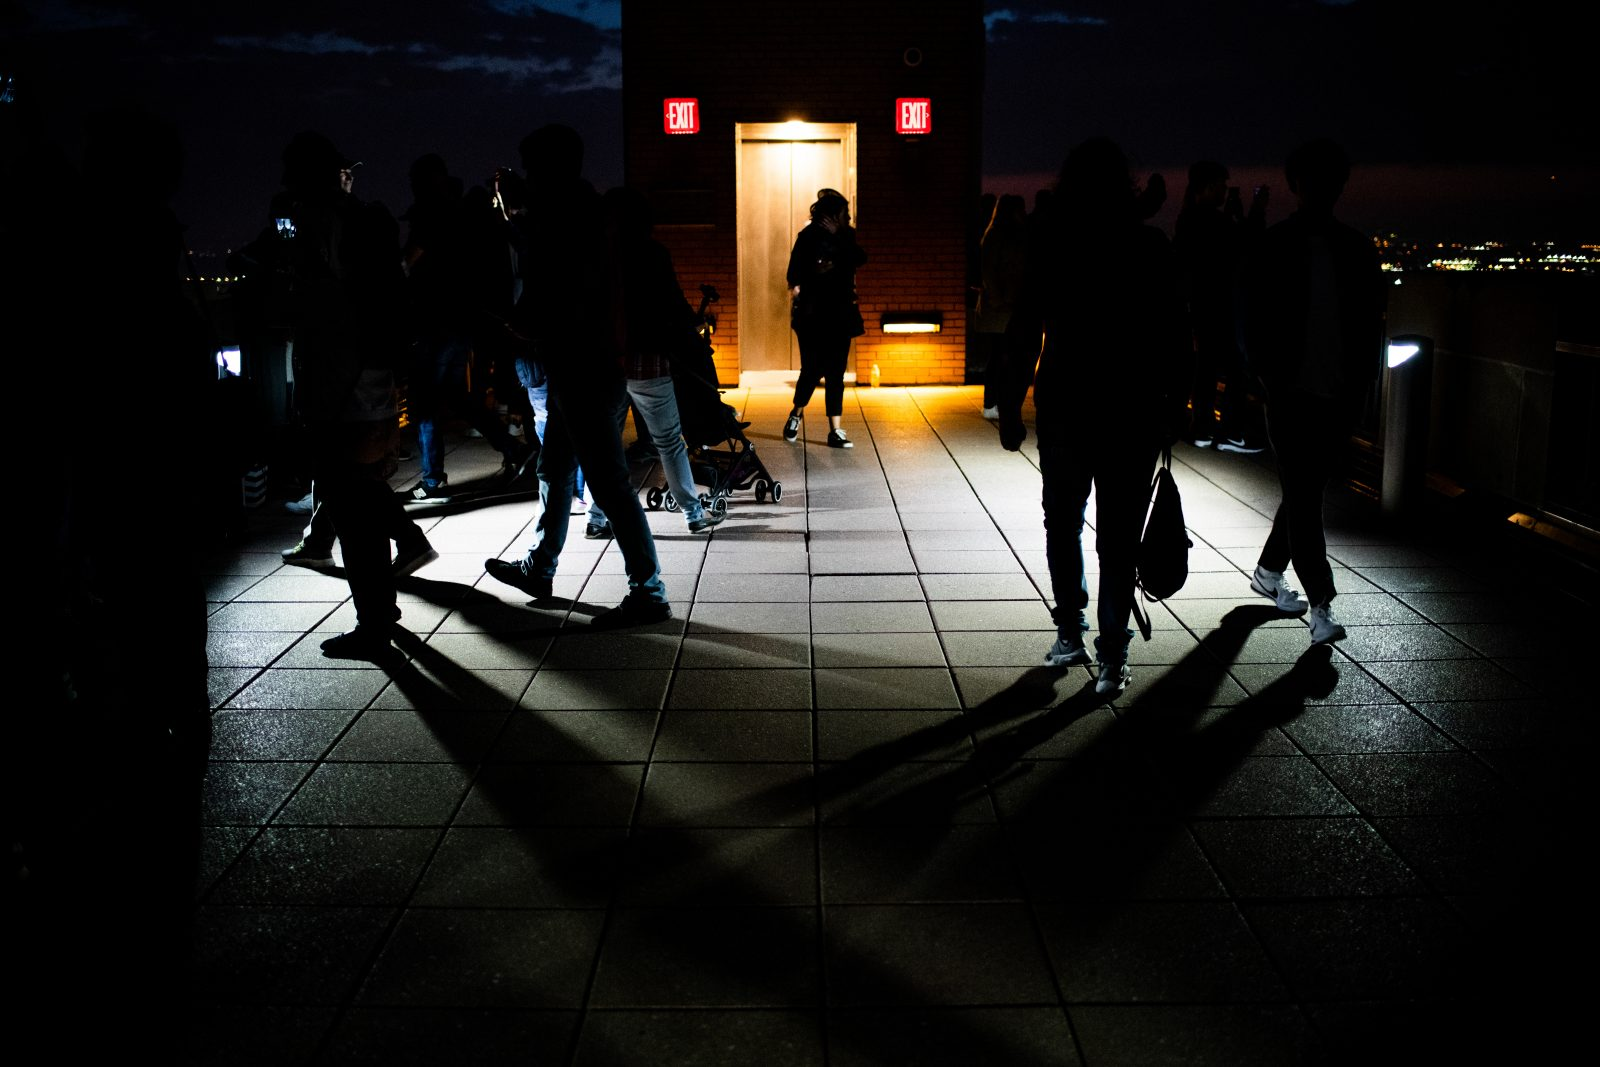 tawf3qpcqvu - Rockefeller Center